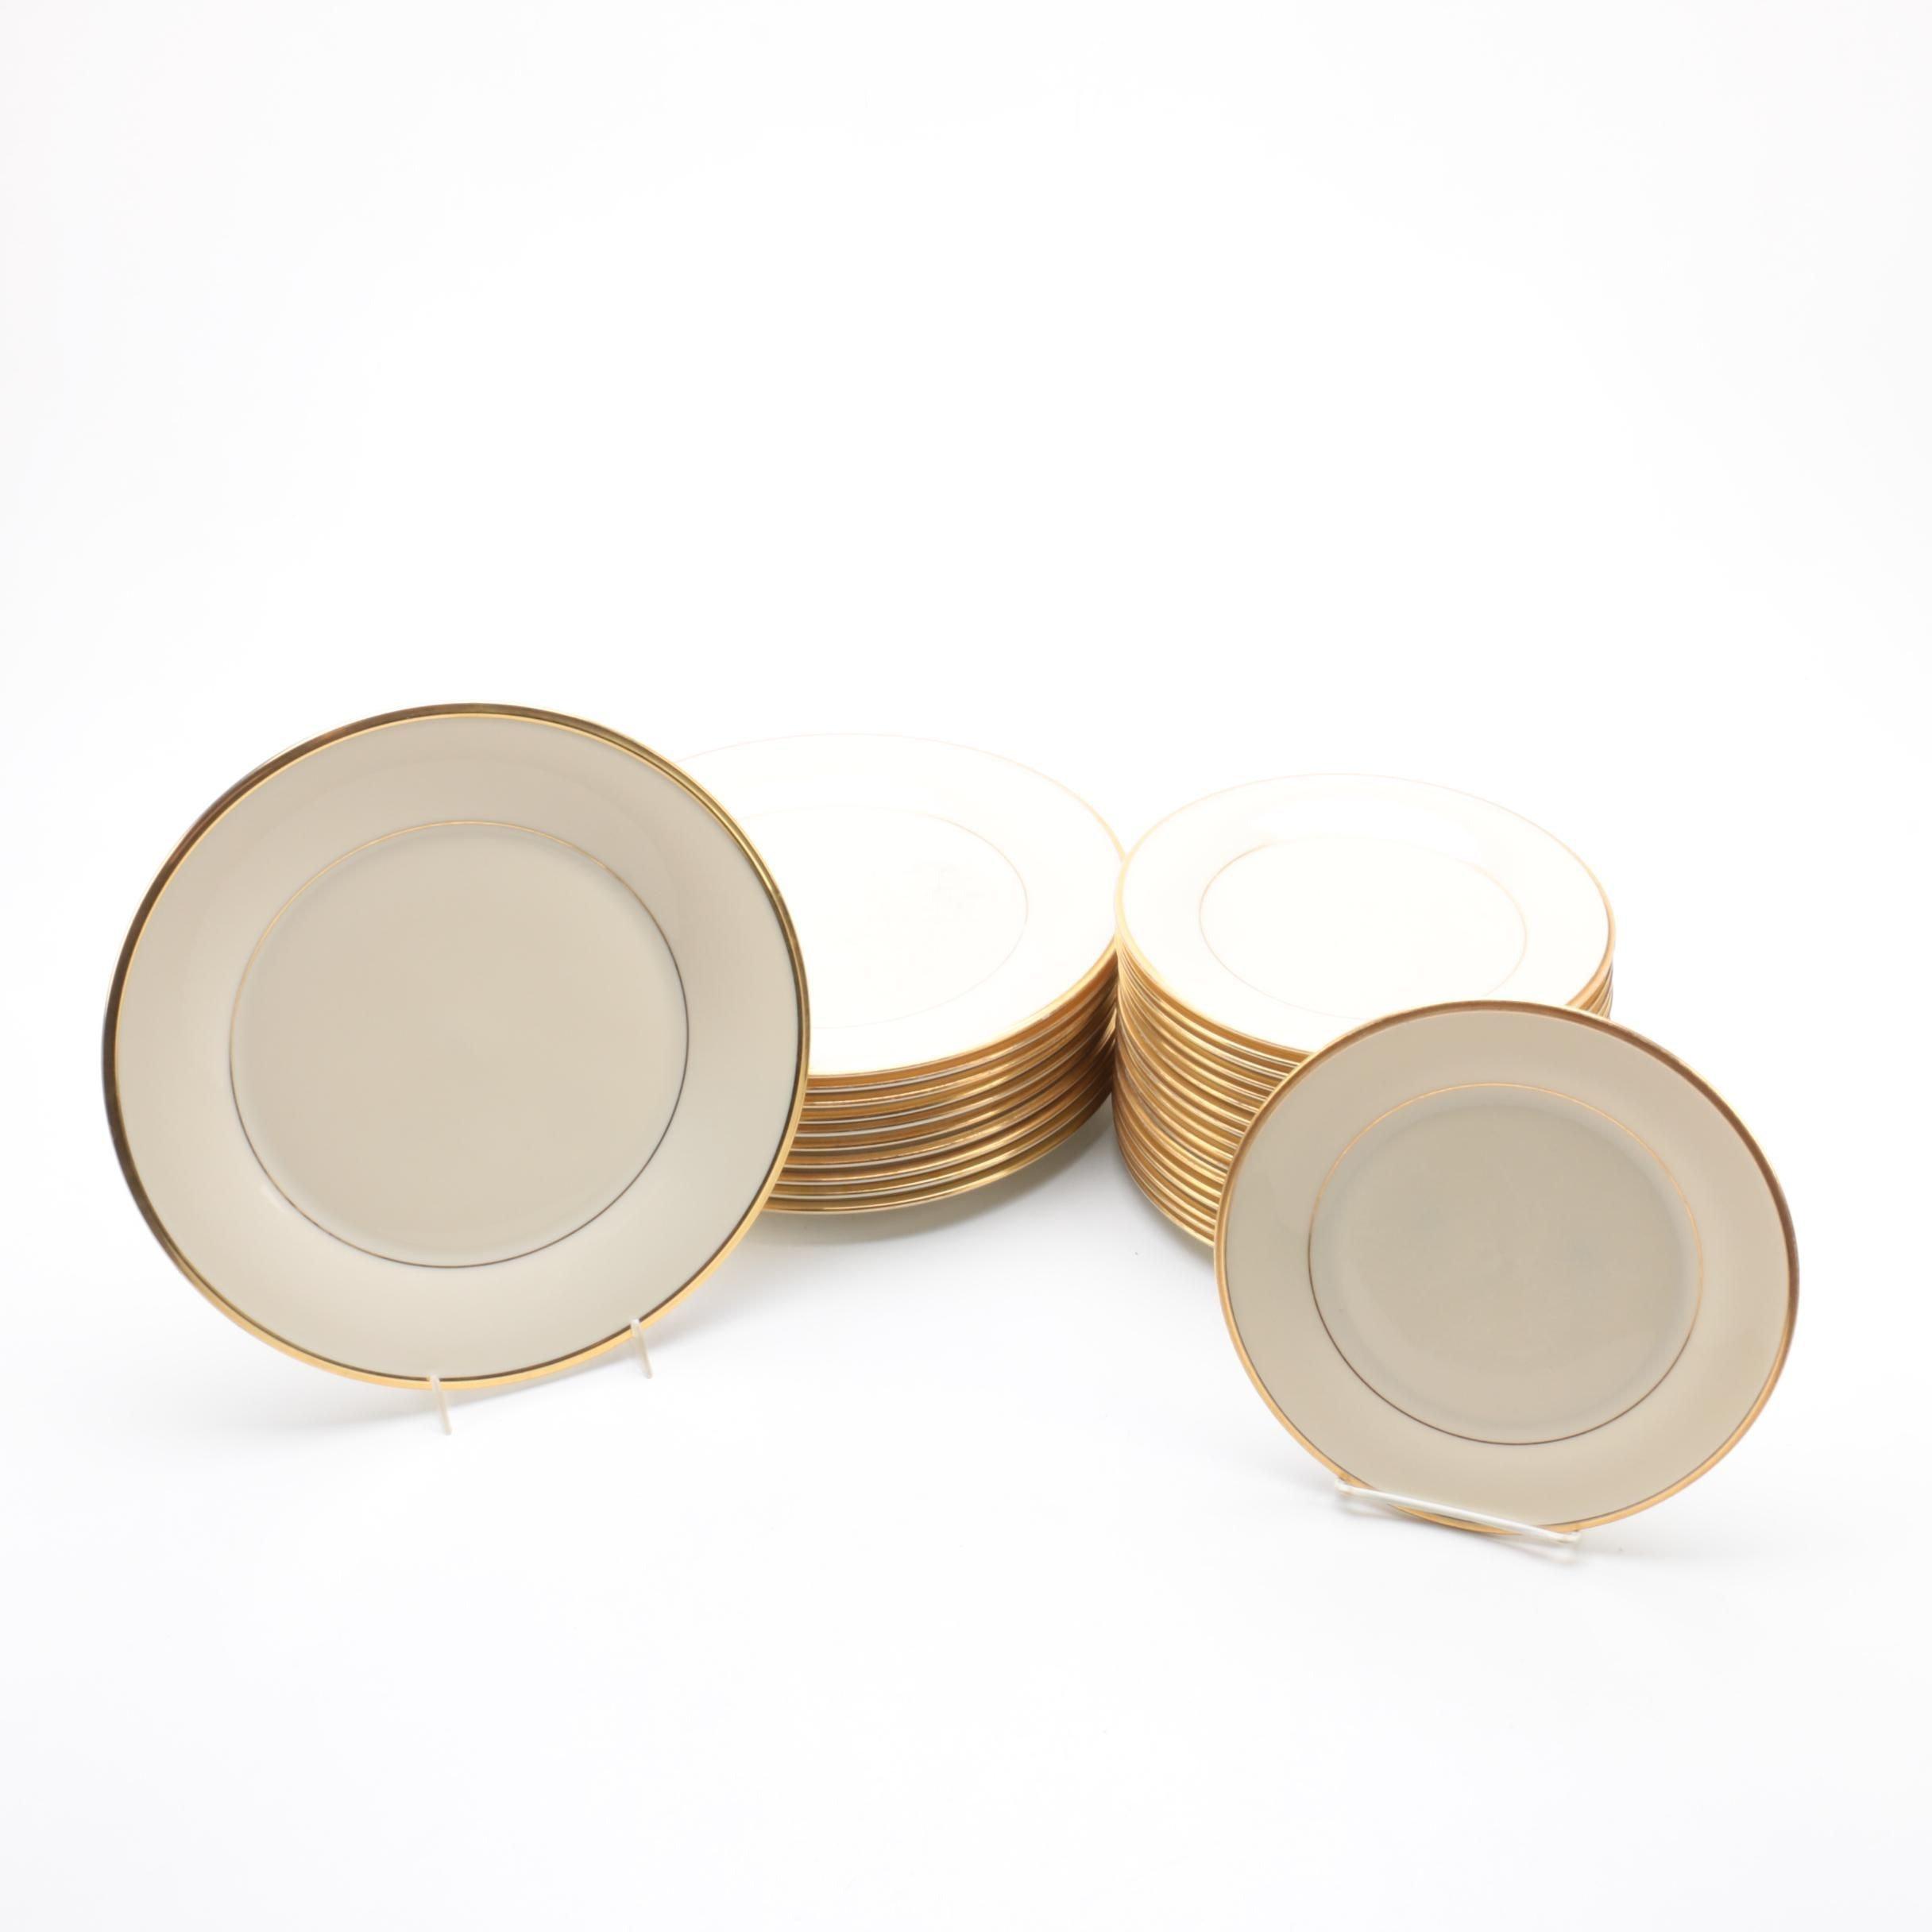 "Lenox ""Eternal"" Porcelain Plates"